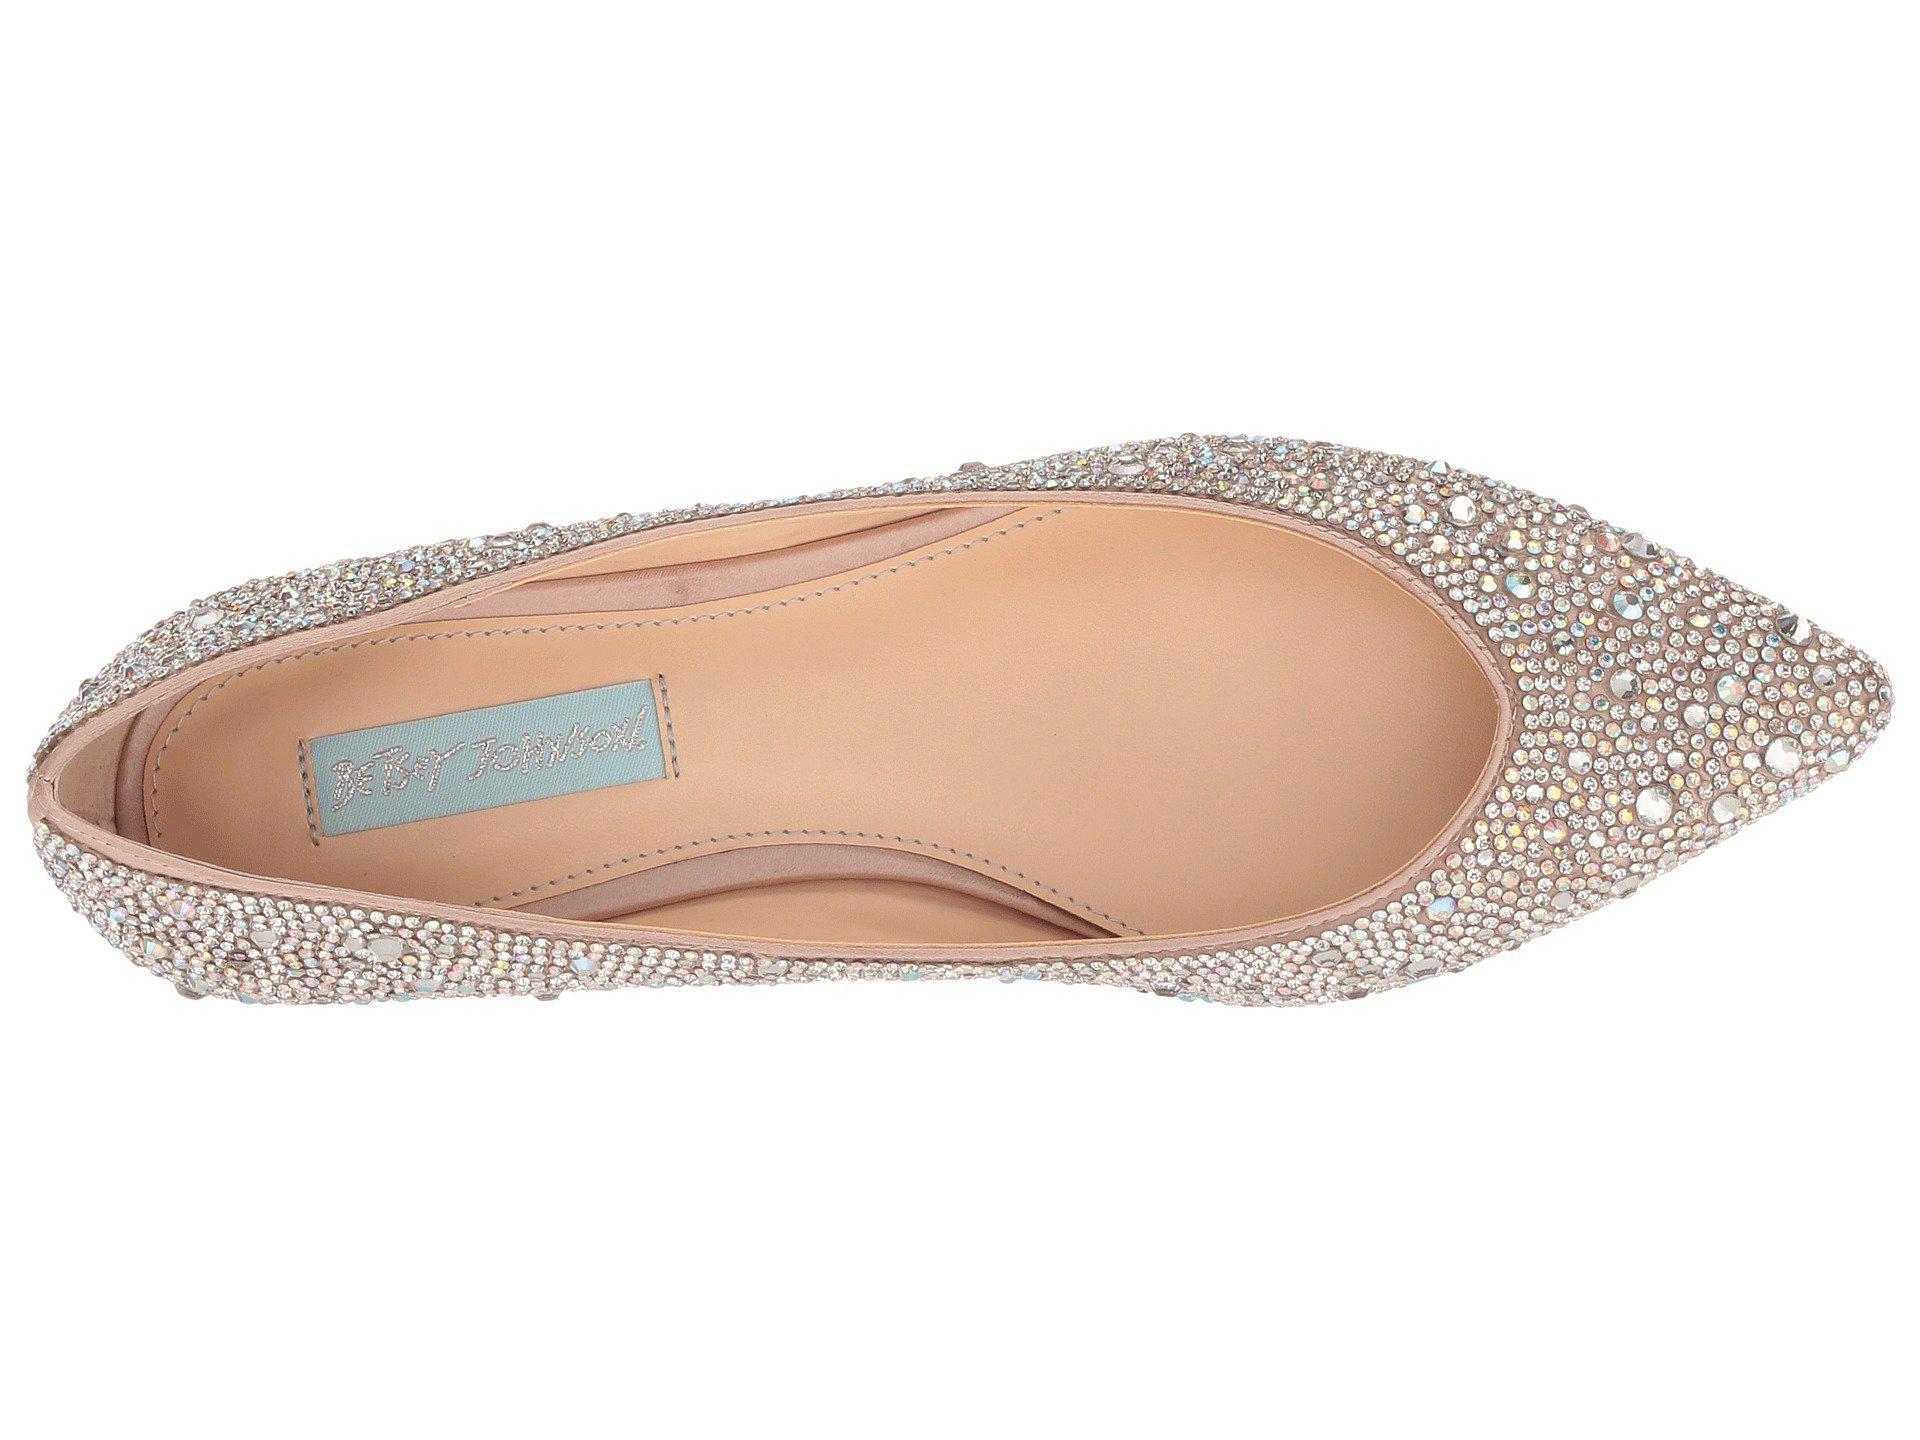 8c8e0c158d5 Lyst - Betsey Johnson Jude (nude Satin) Women s Dress Flat Shoes